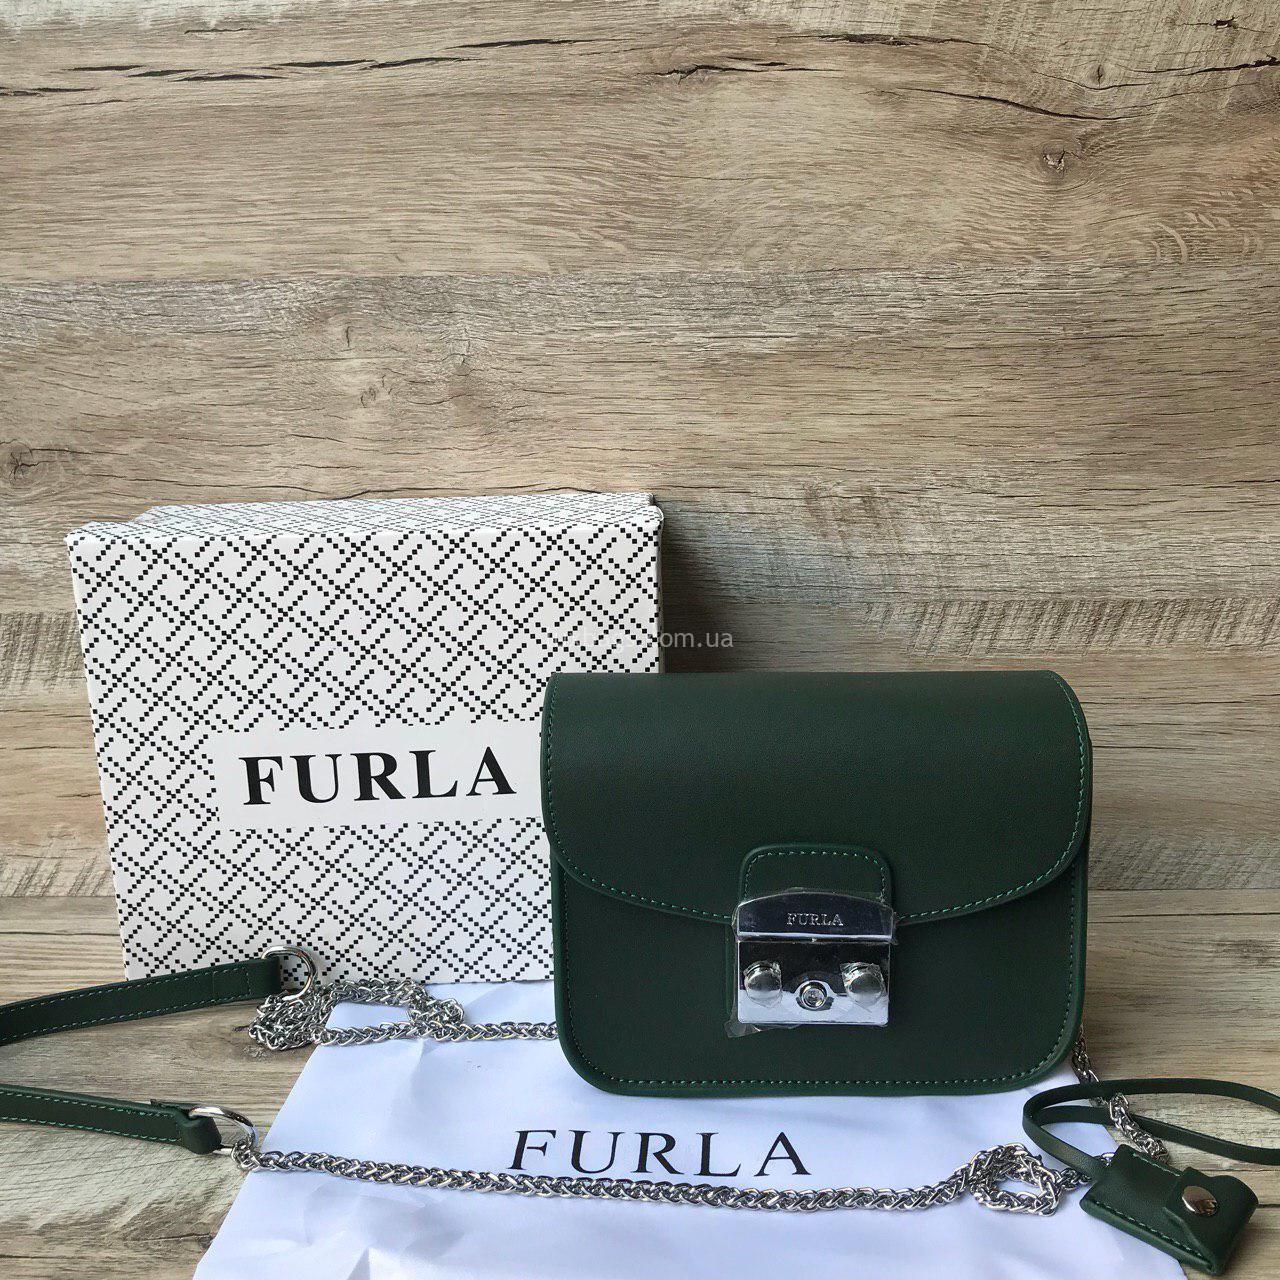 90e057a8db22 Furla Metropolis (Фурда Метрополис) копия купить на lux-bags